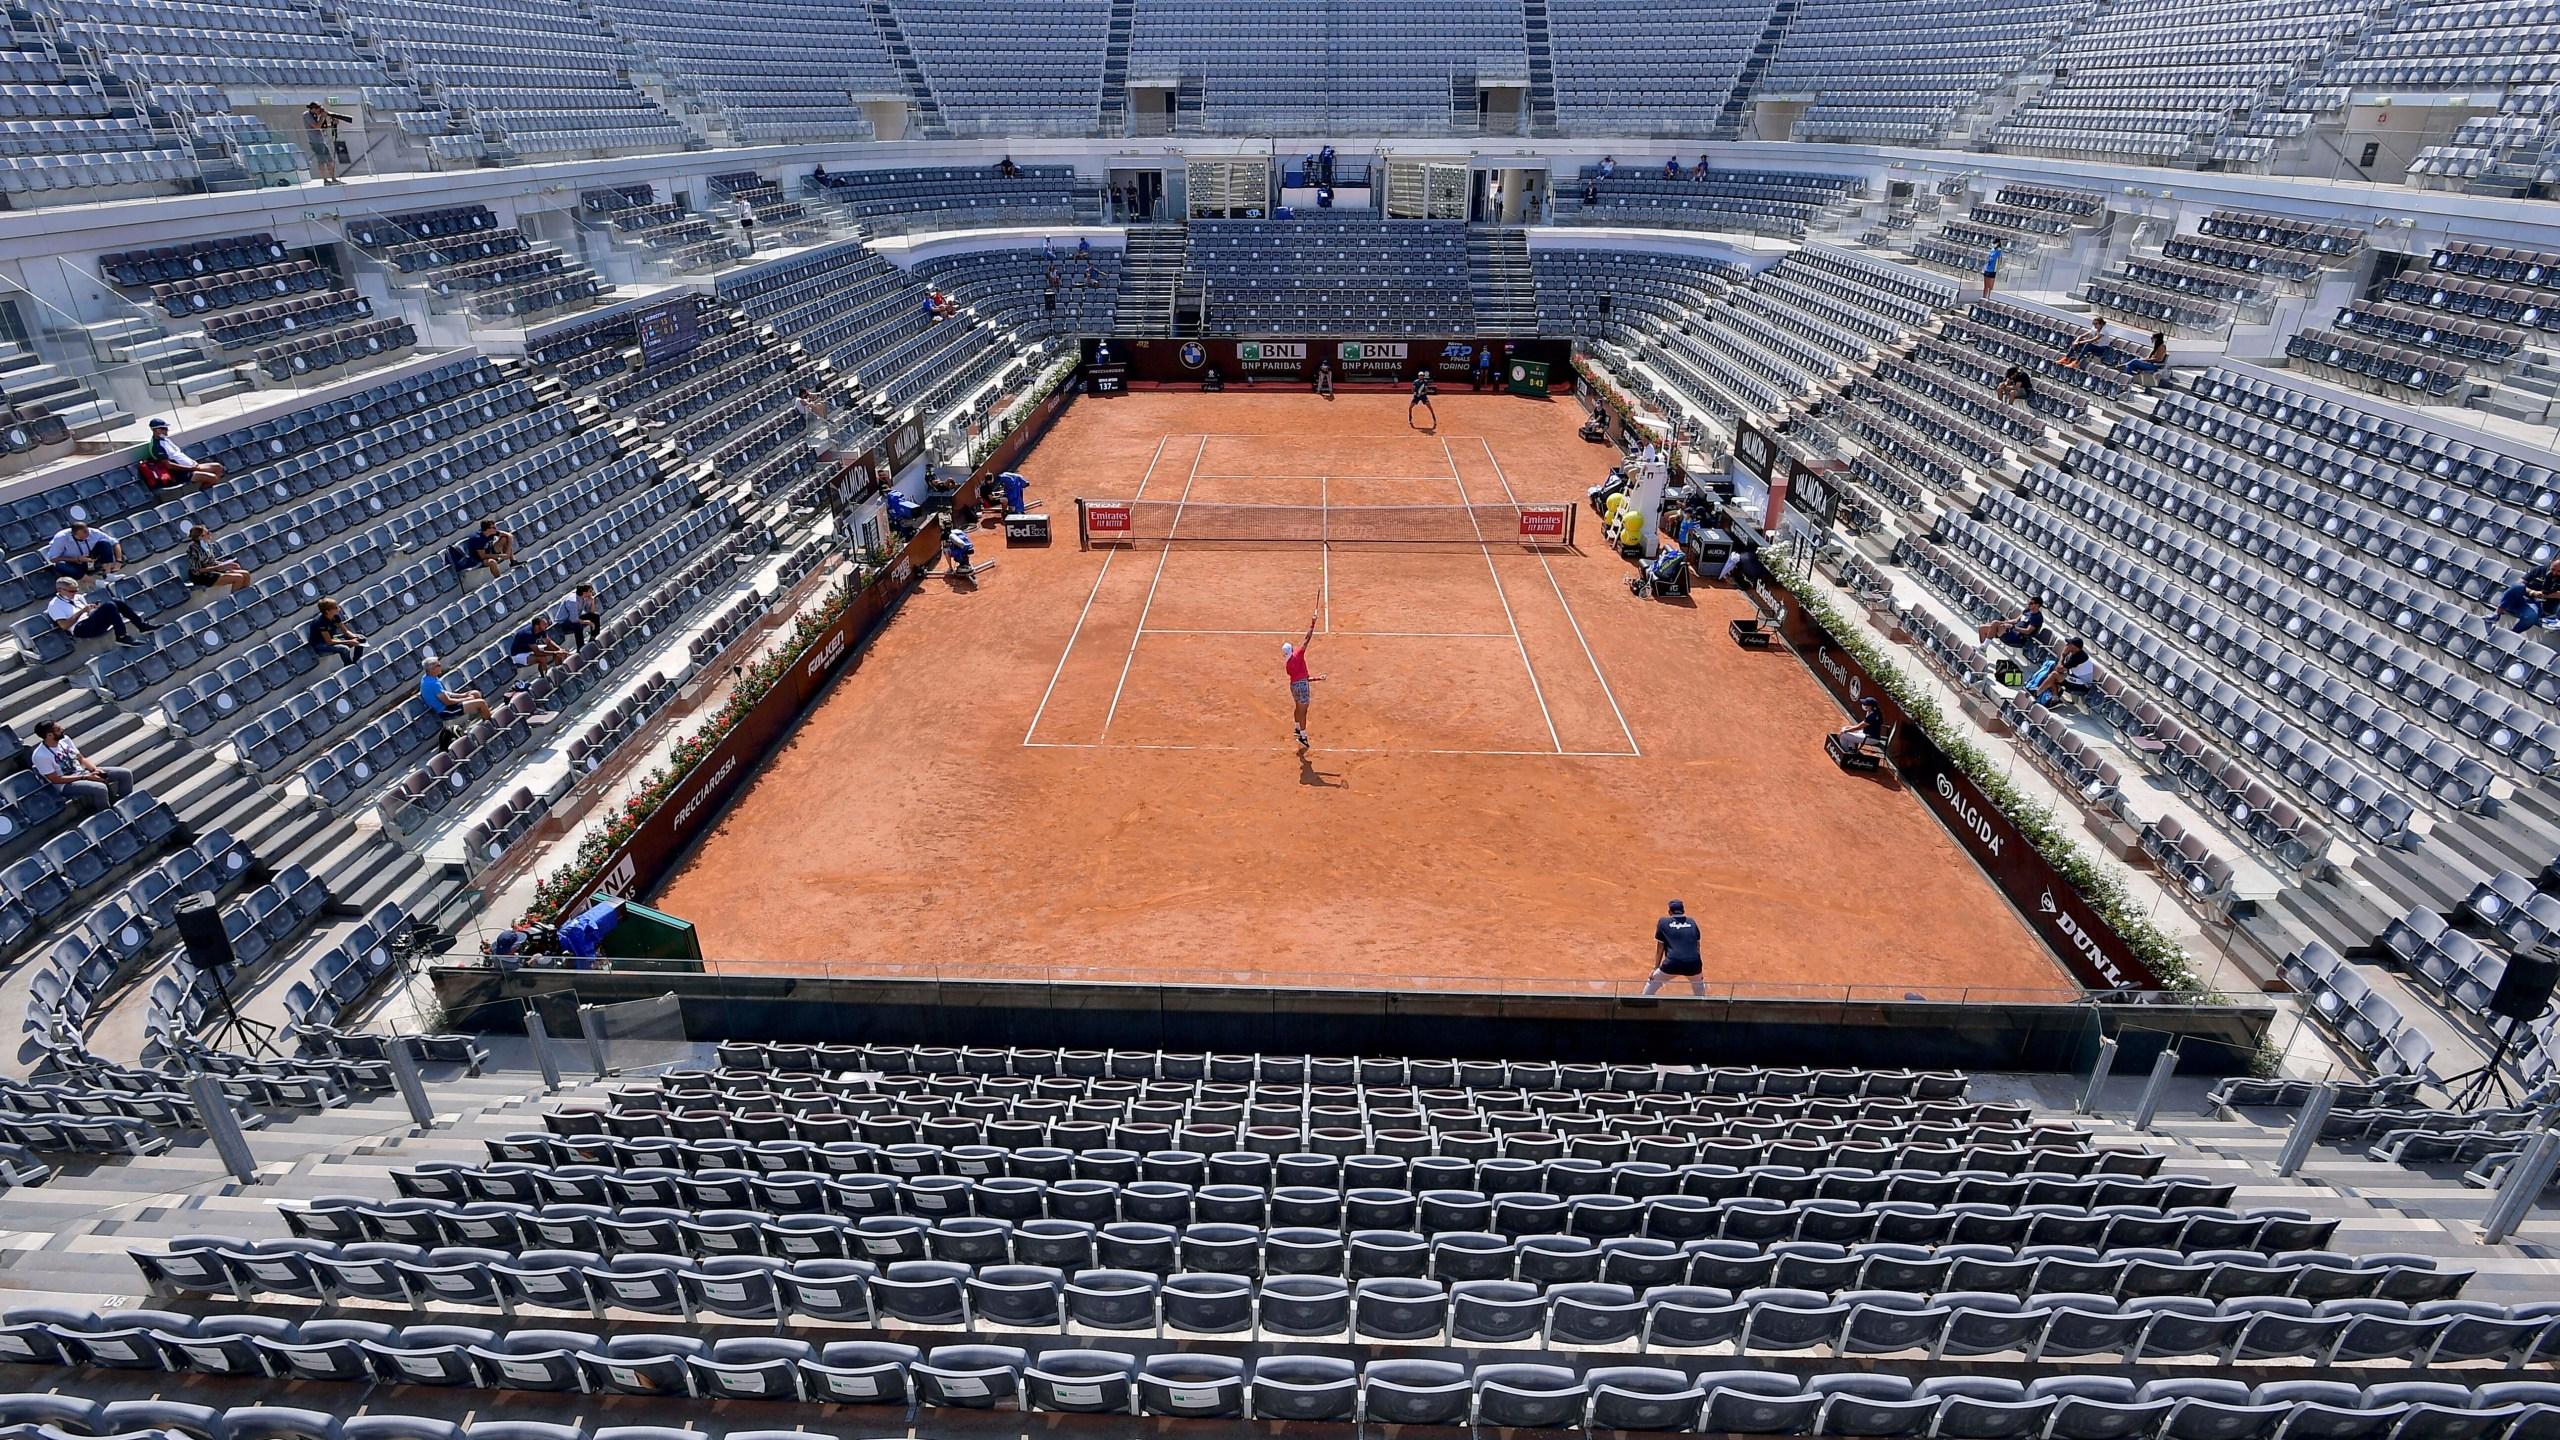 Djokovic Behaves Better In 1st Match Since Us Open Default Ksnt News